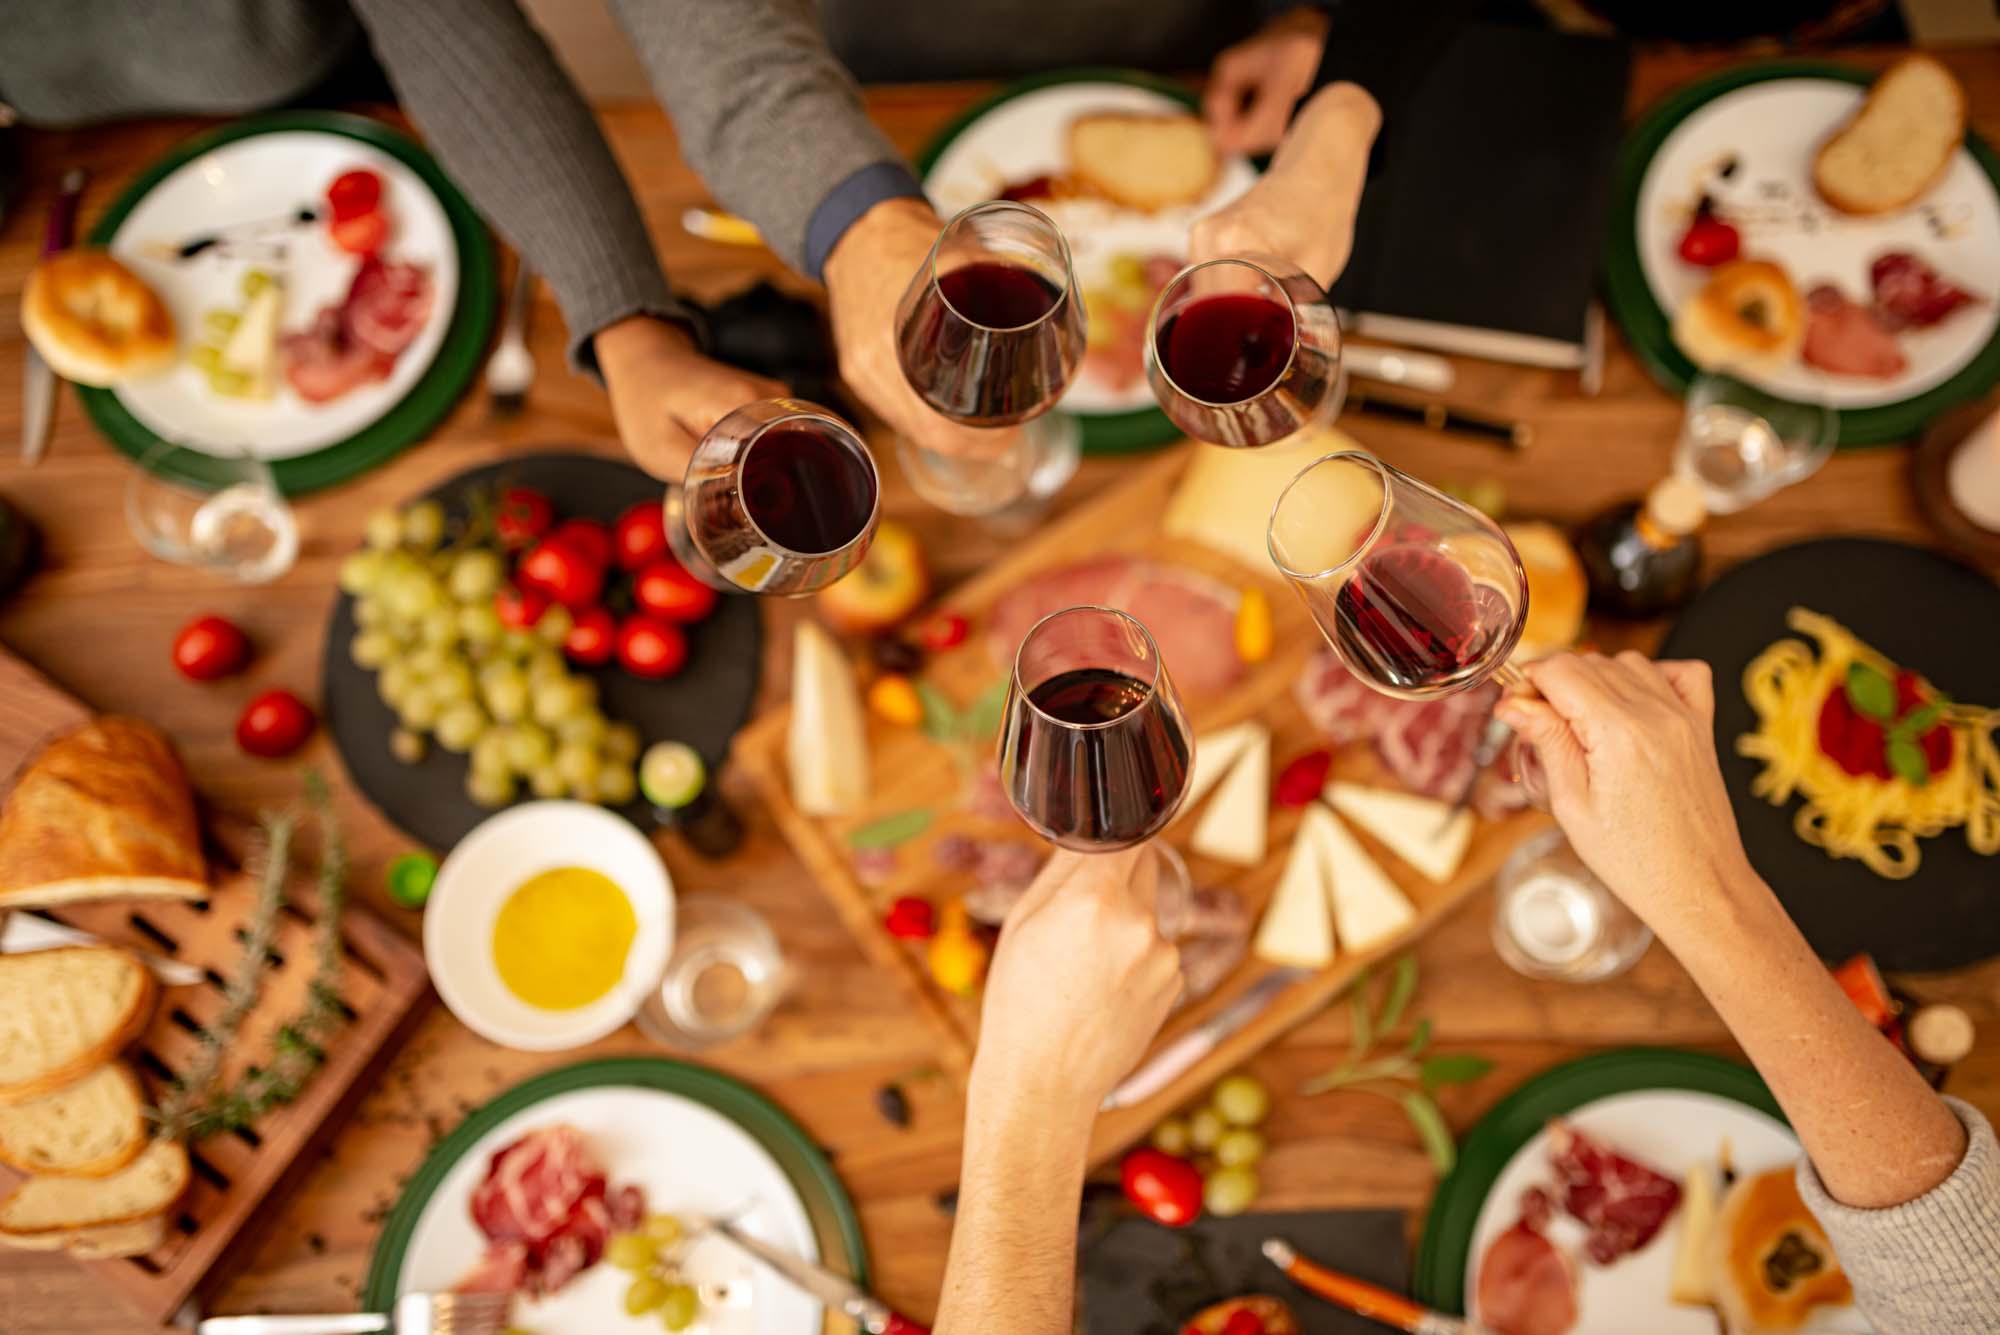 Cucina Amatoriale Formazione Manageriale a Genova